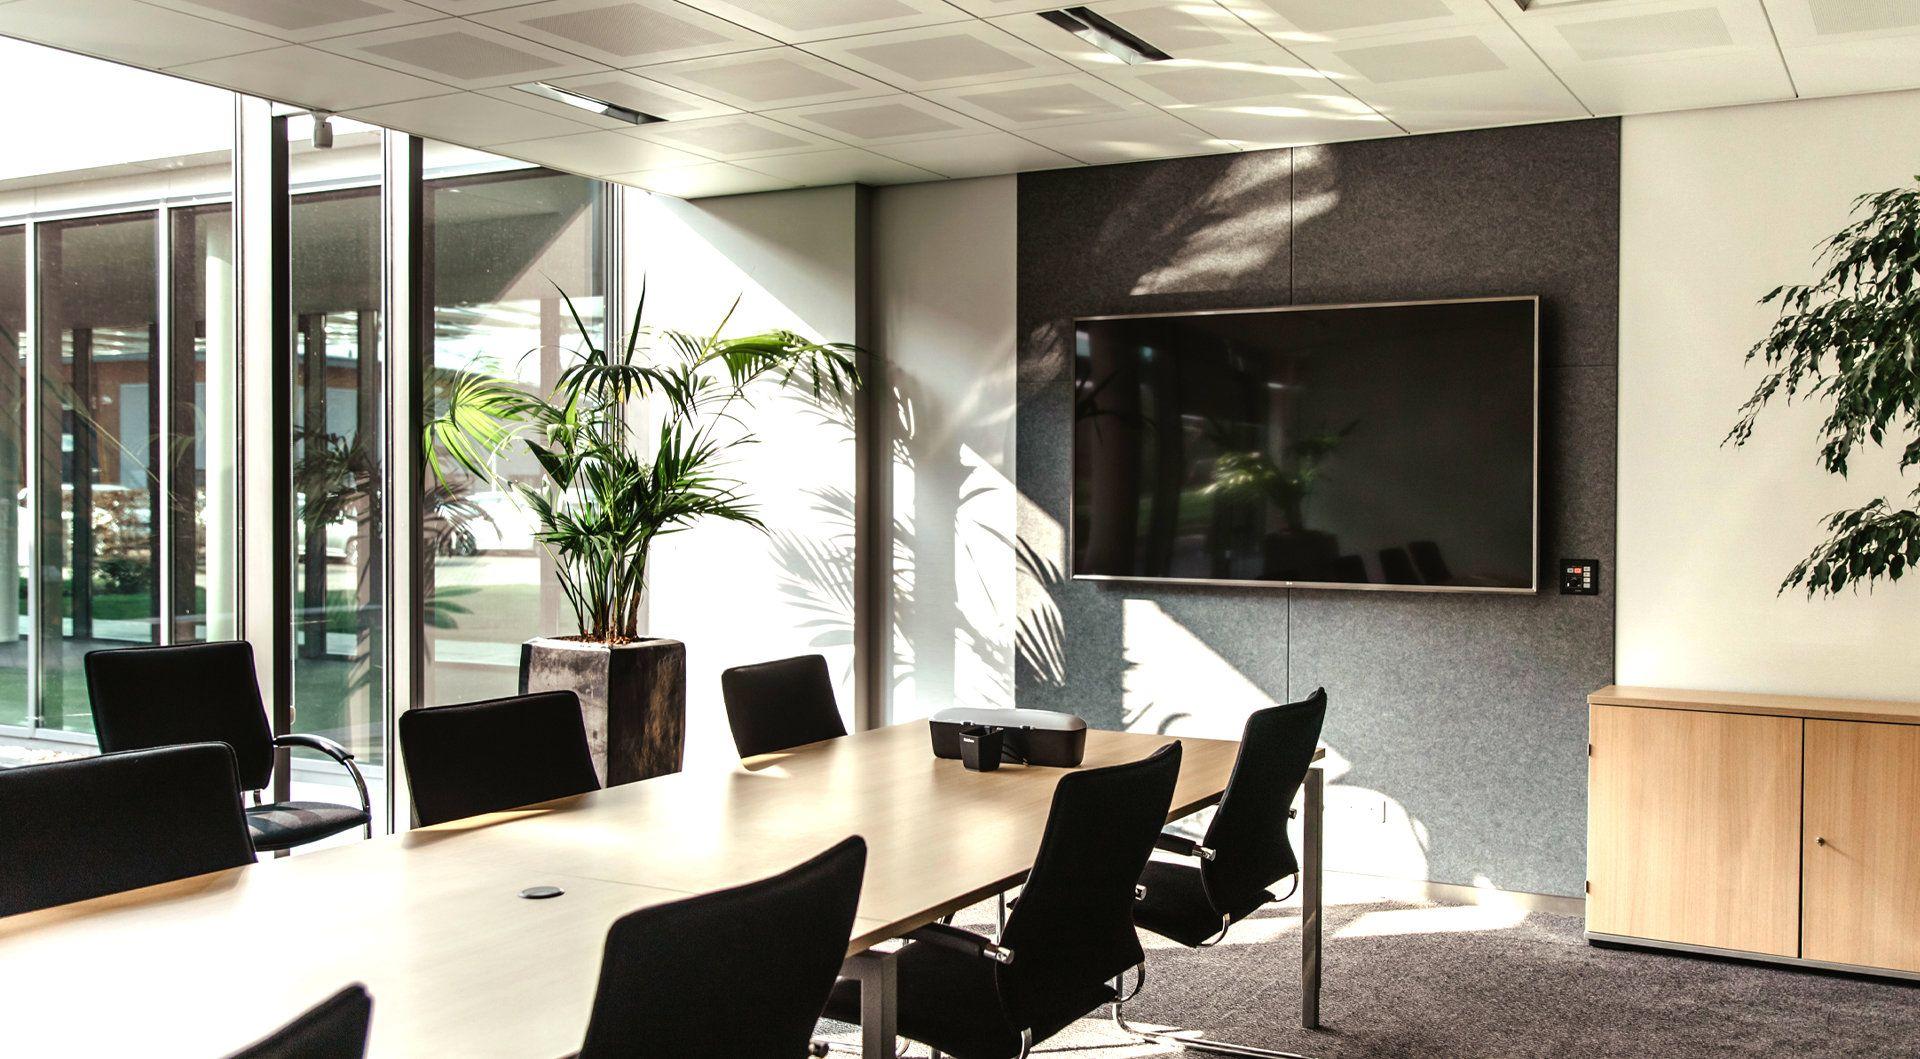 Benq MW826ST beamer/projector 3400 ANSI lumens DLP WXGA (1280x800) 3D Desktopprojector Wit - Case studie de vries